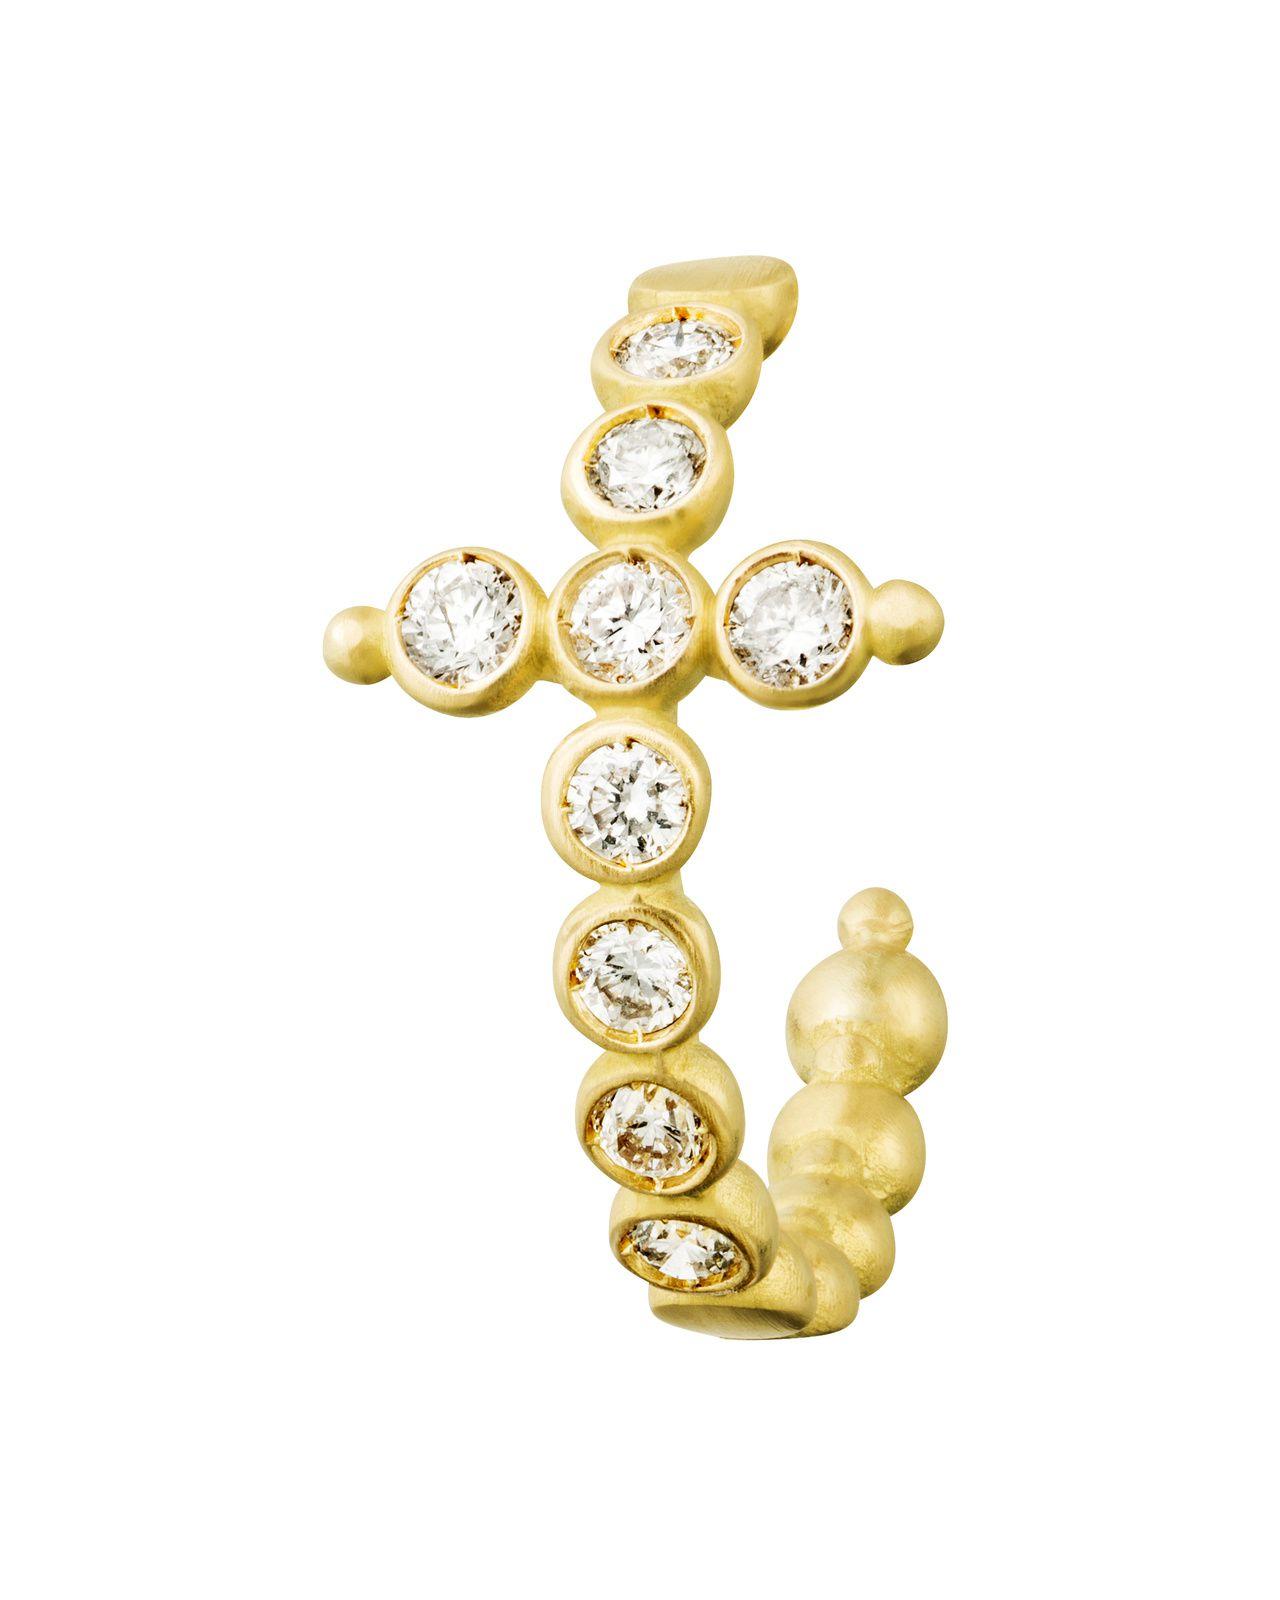 Boucles d'oreilles FOLLES IGUAZU,or,diamants © AIMEE.AIMER